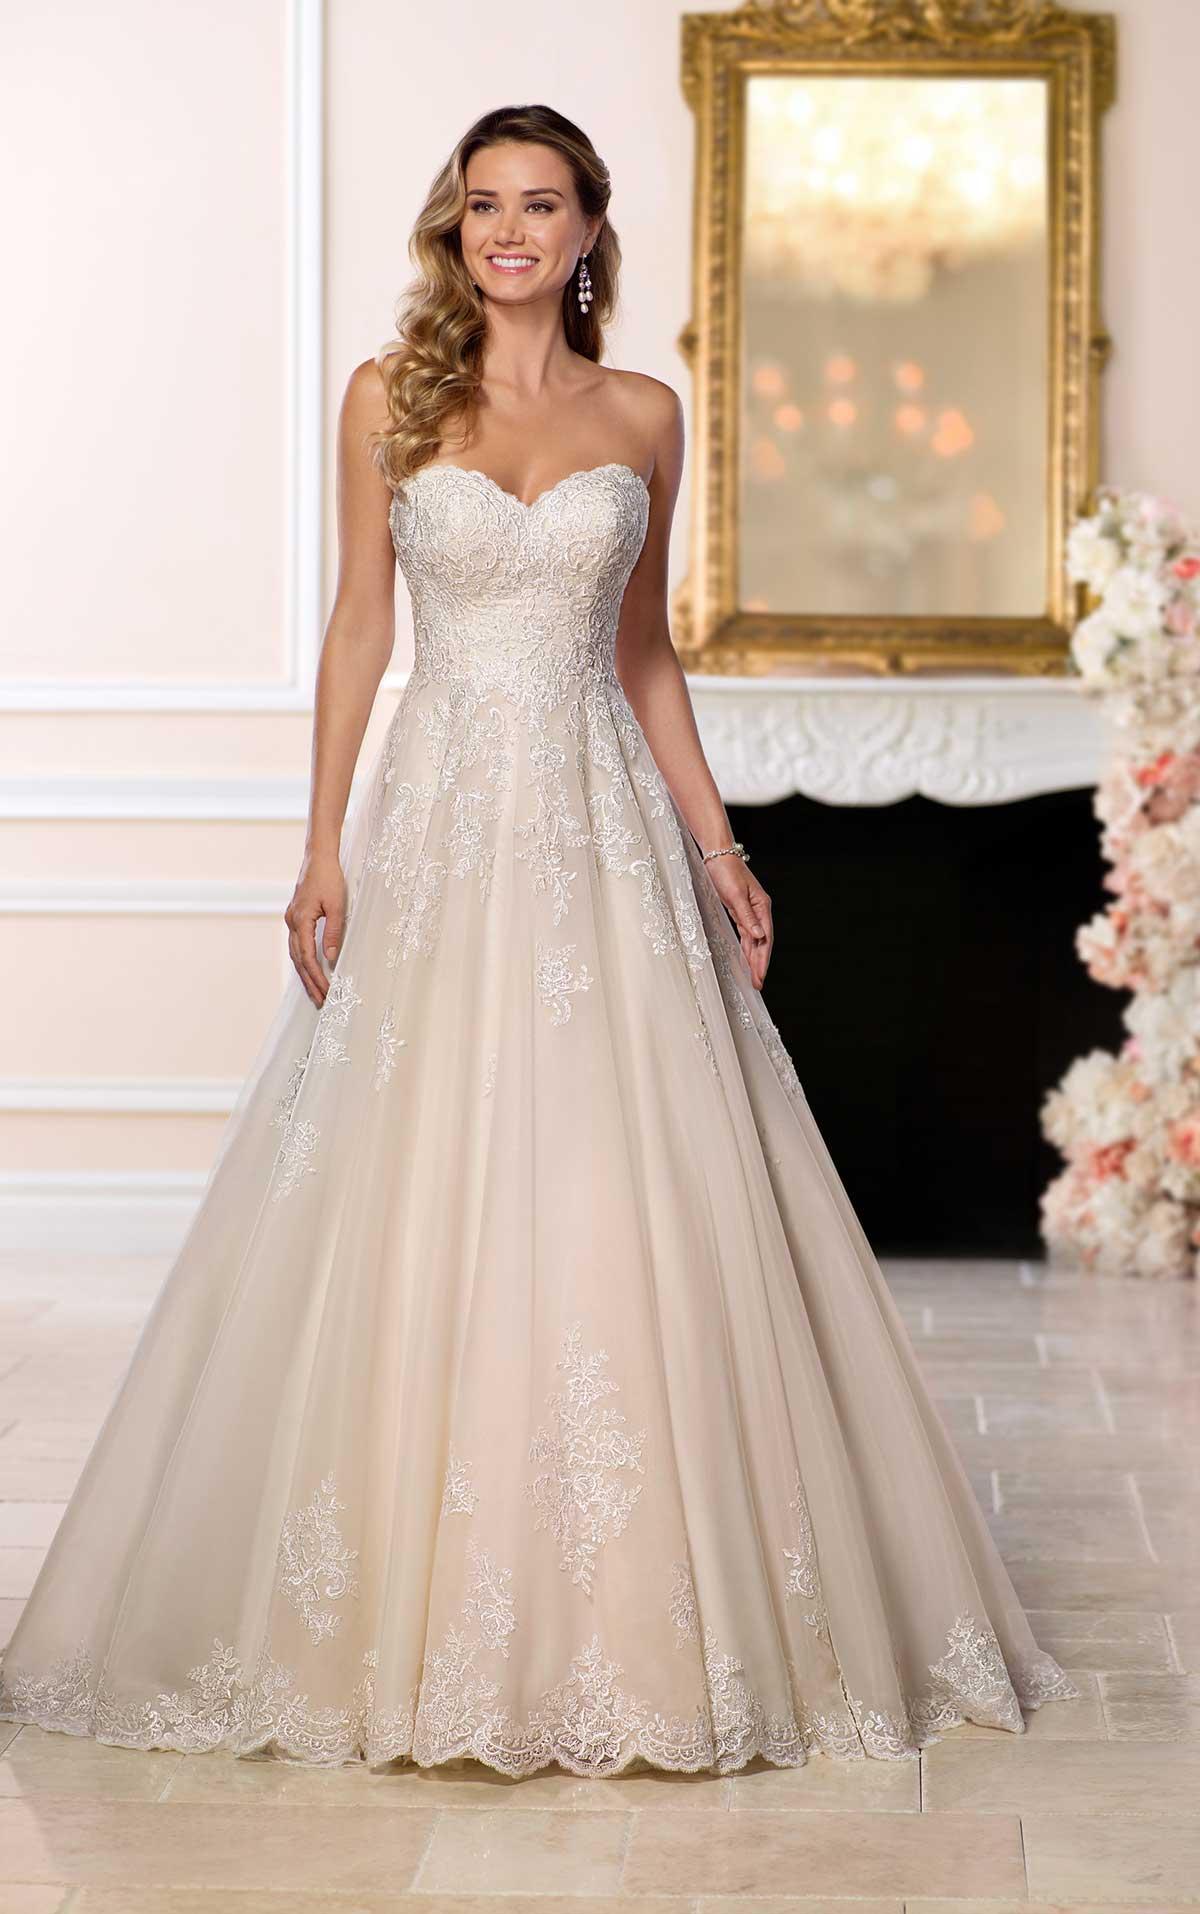 stella york wedding dresses photo - 1